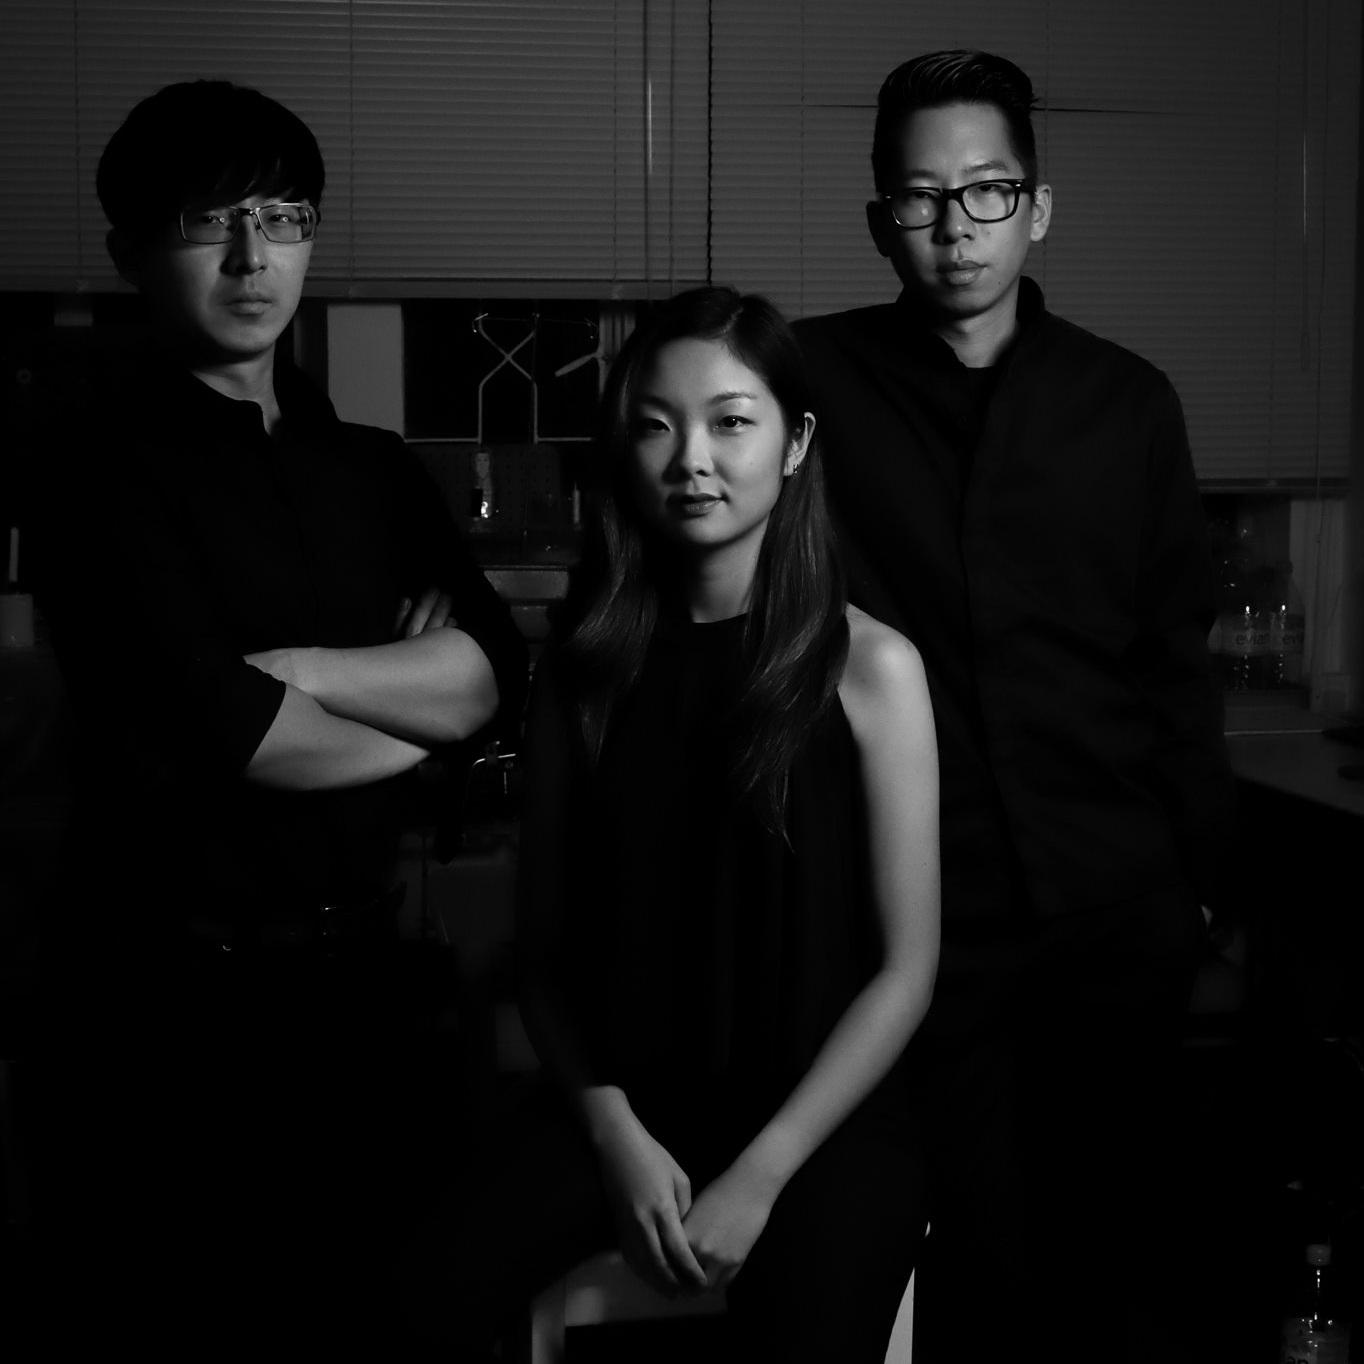 PCMF FESTIVAL EVENT 02 - Feature Concert I : EXORDIUM Collective - Young Composers Portrait Concert